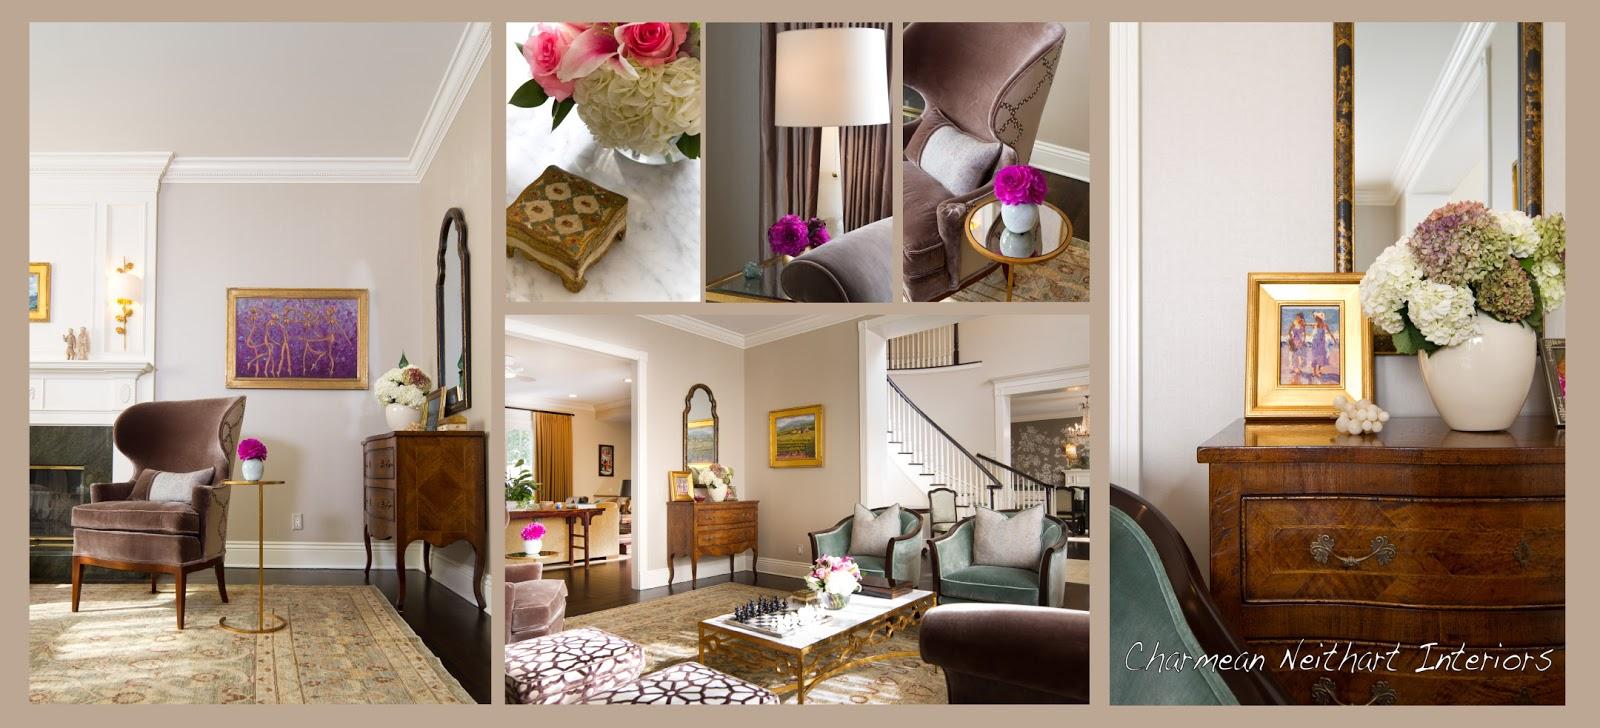 Erika bierman photography charmean neithart interiors for British home interiors